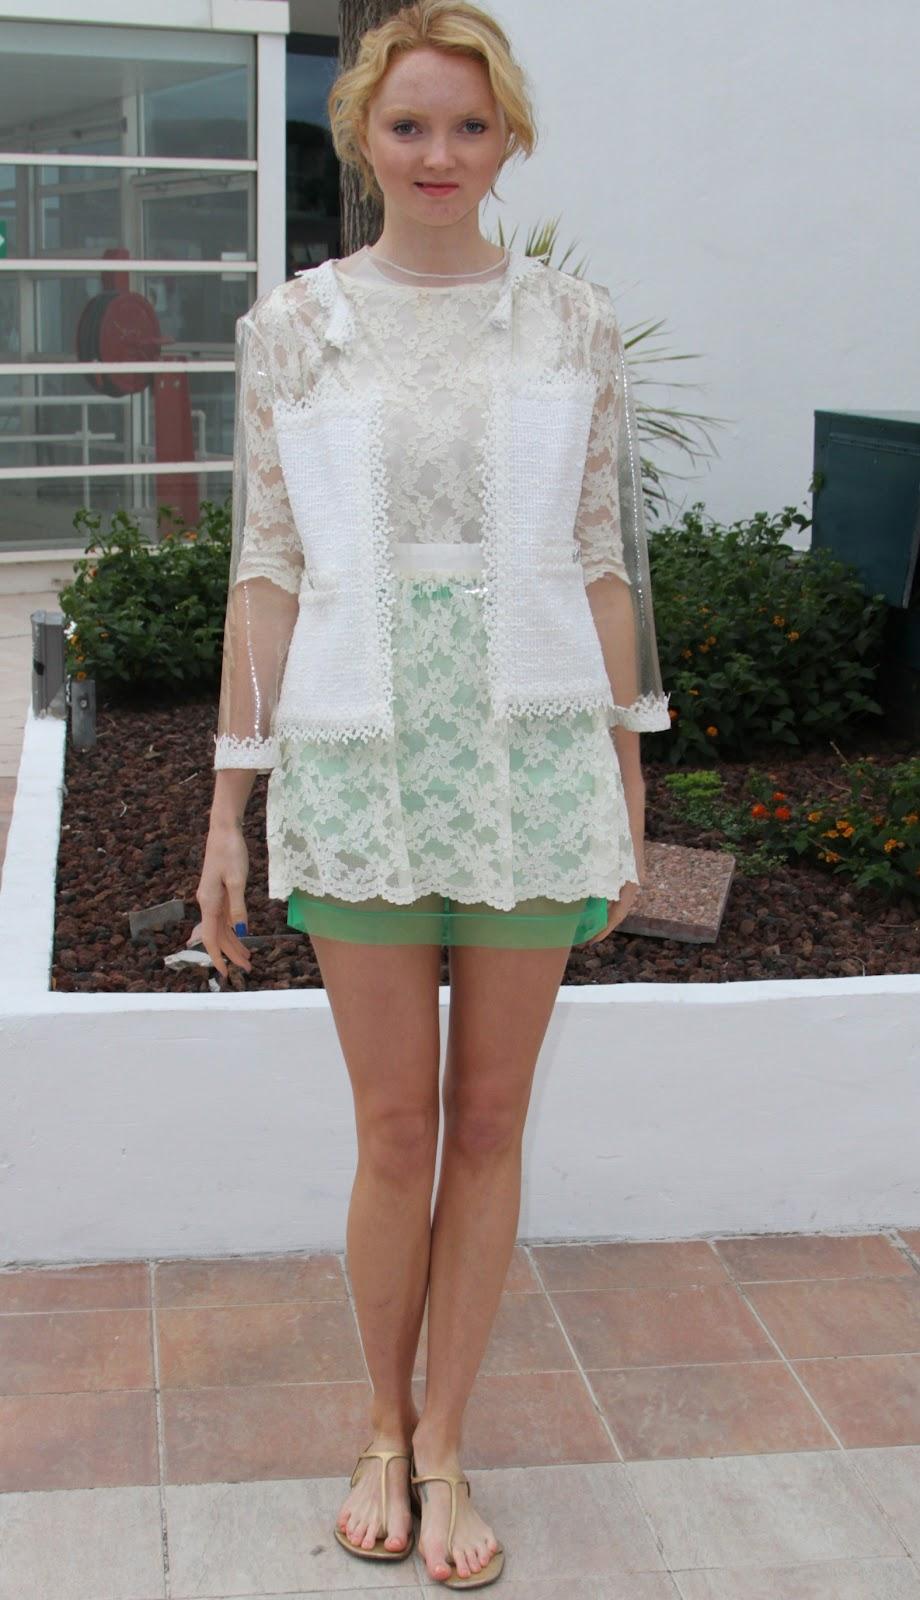 Lara Stone Natasha Poly Amp More Party At Cannes Film